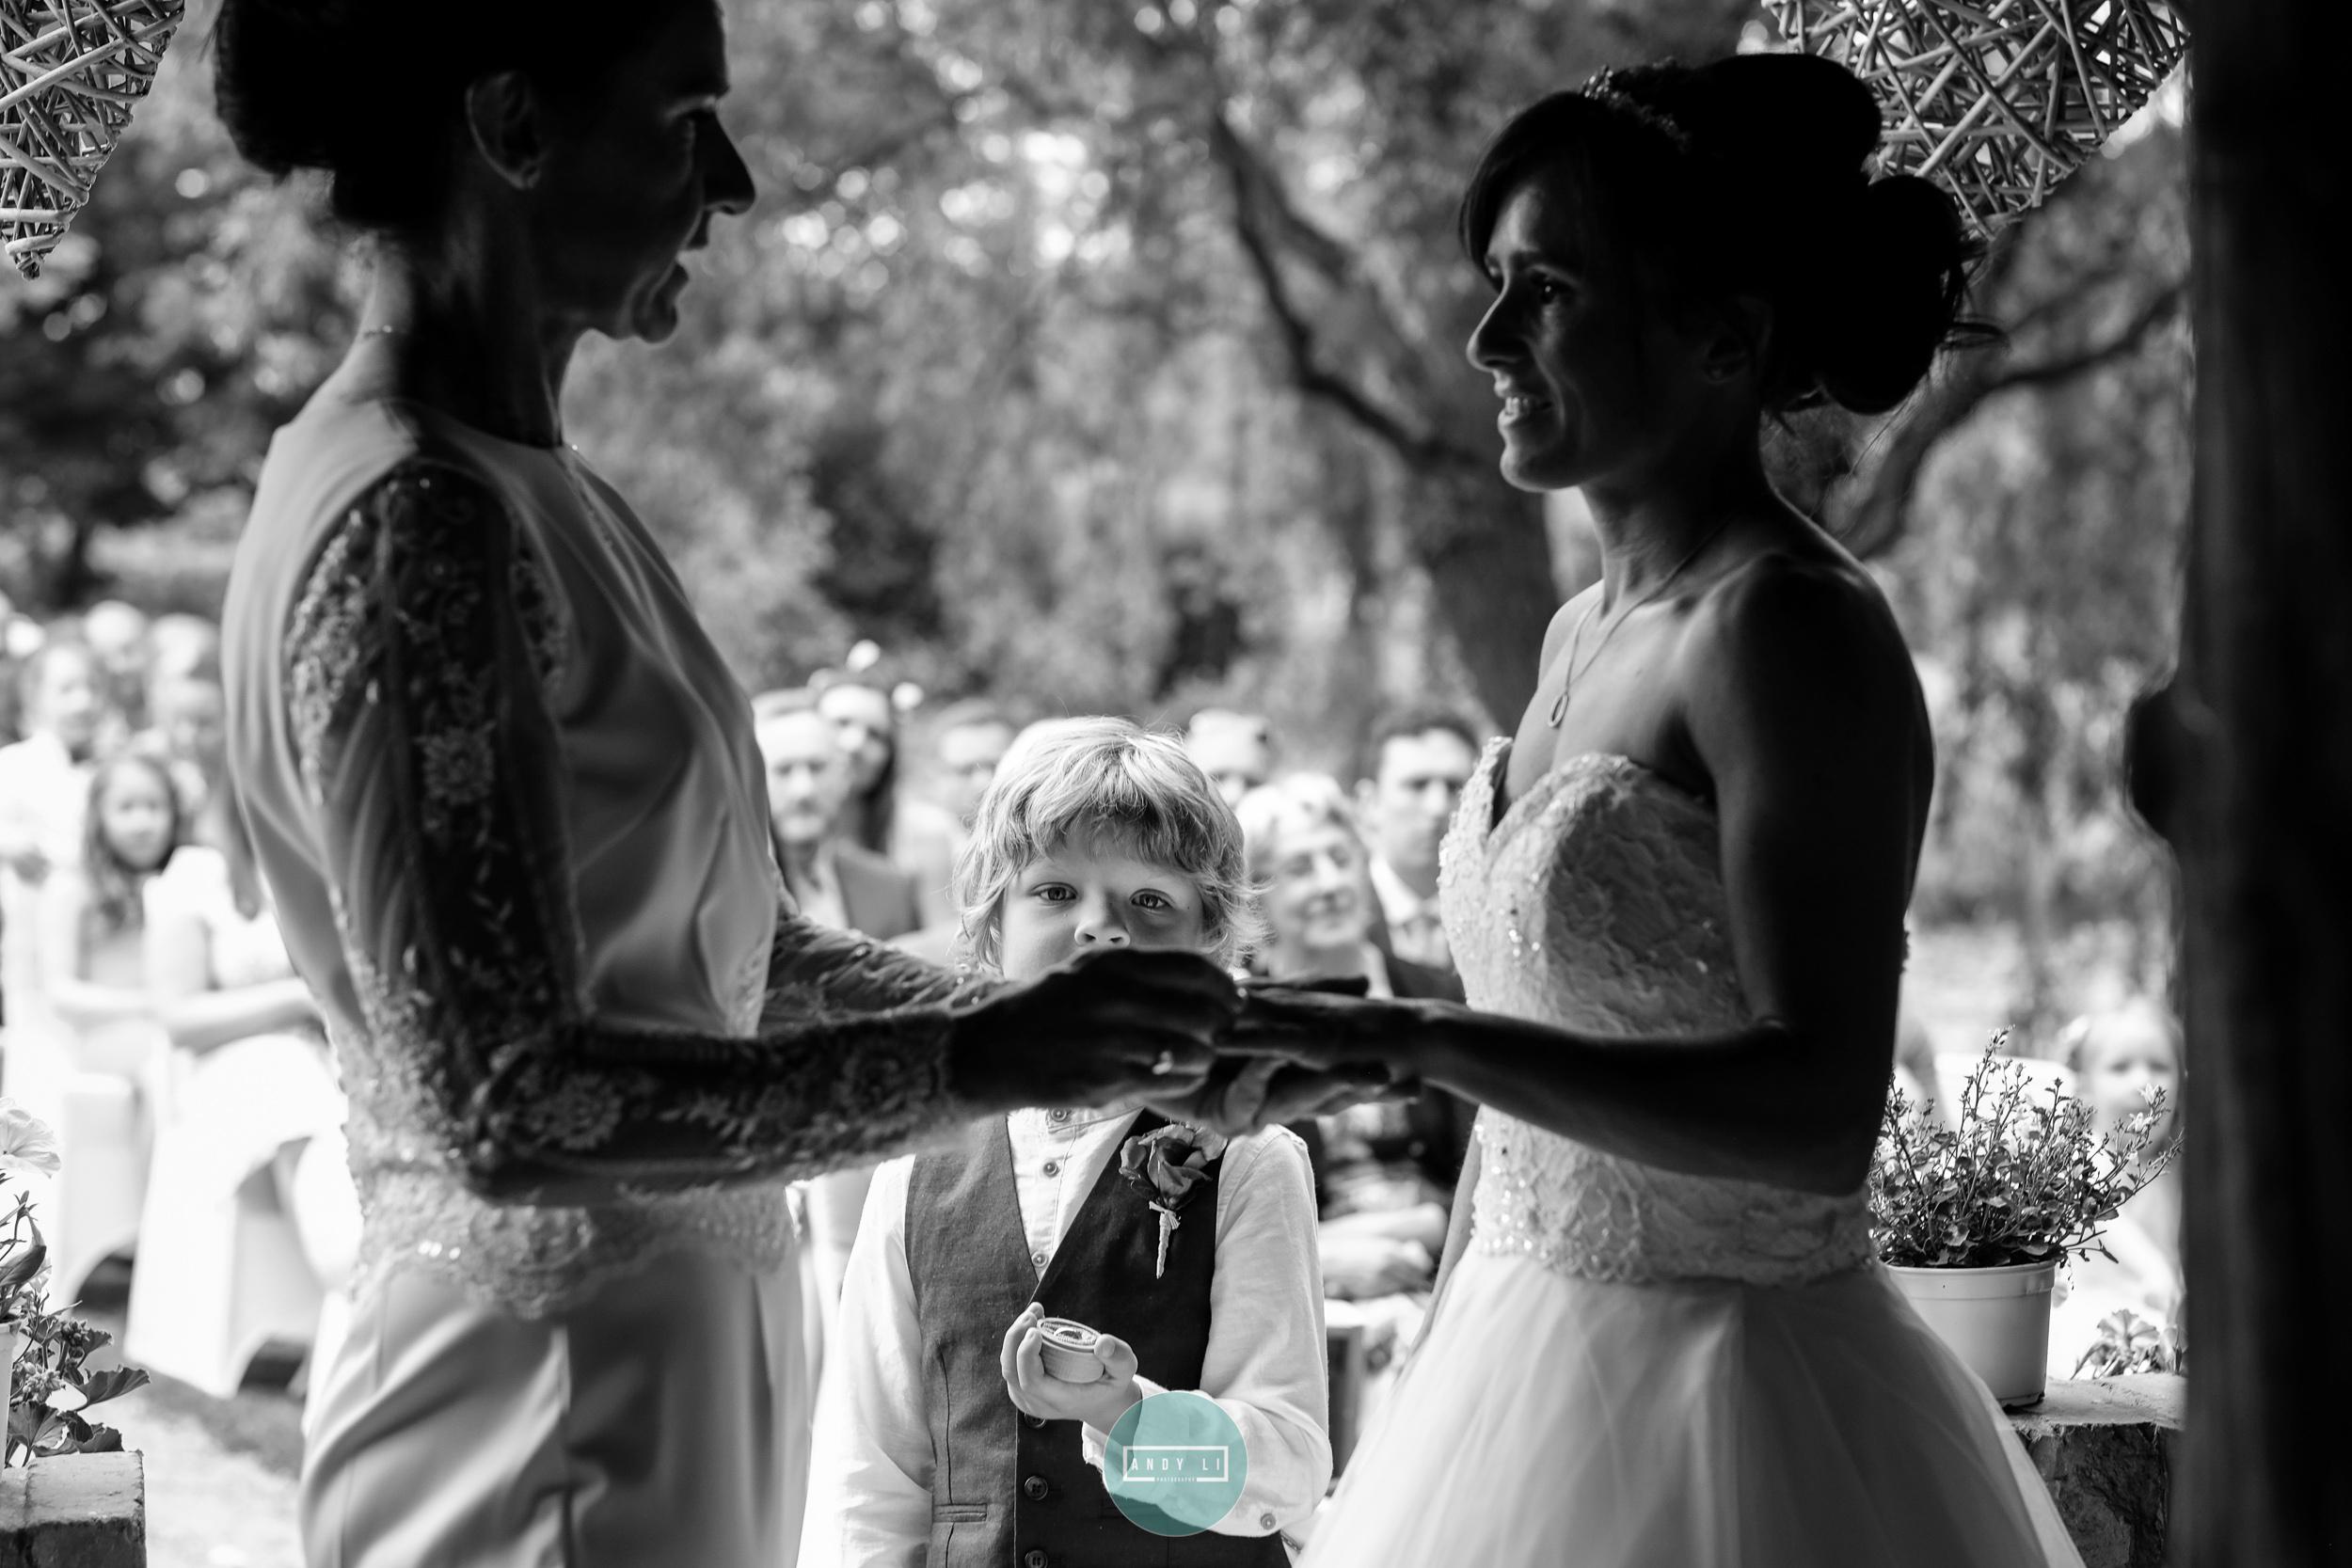 Manley Mere Cheshire Wedding Photographer-004-XPRO9935.jpg